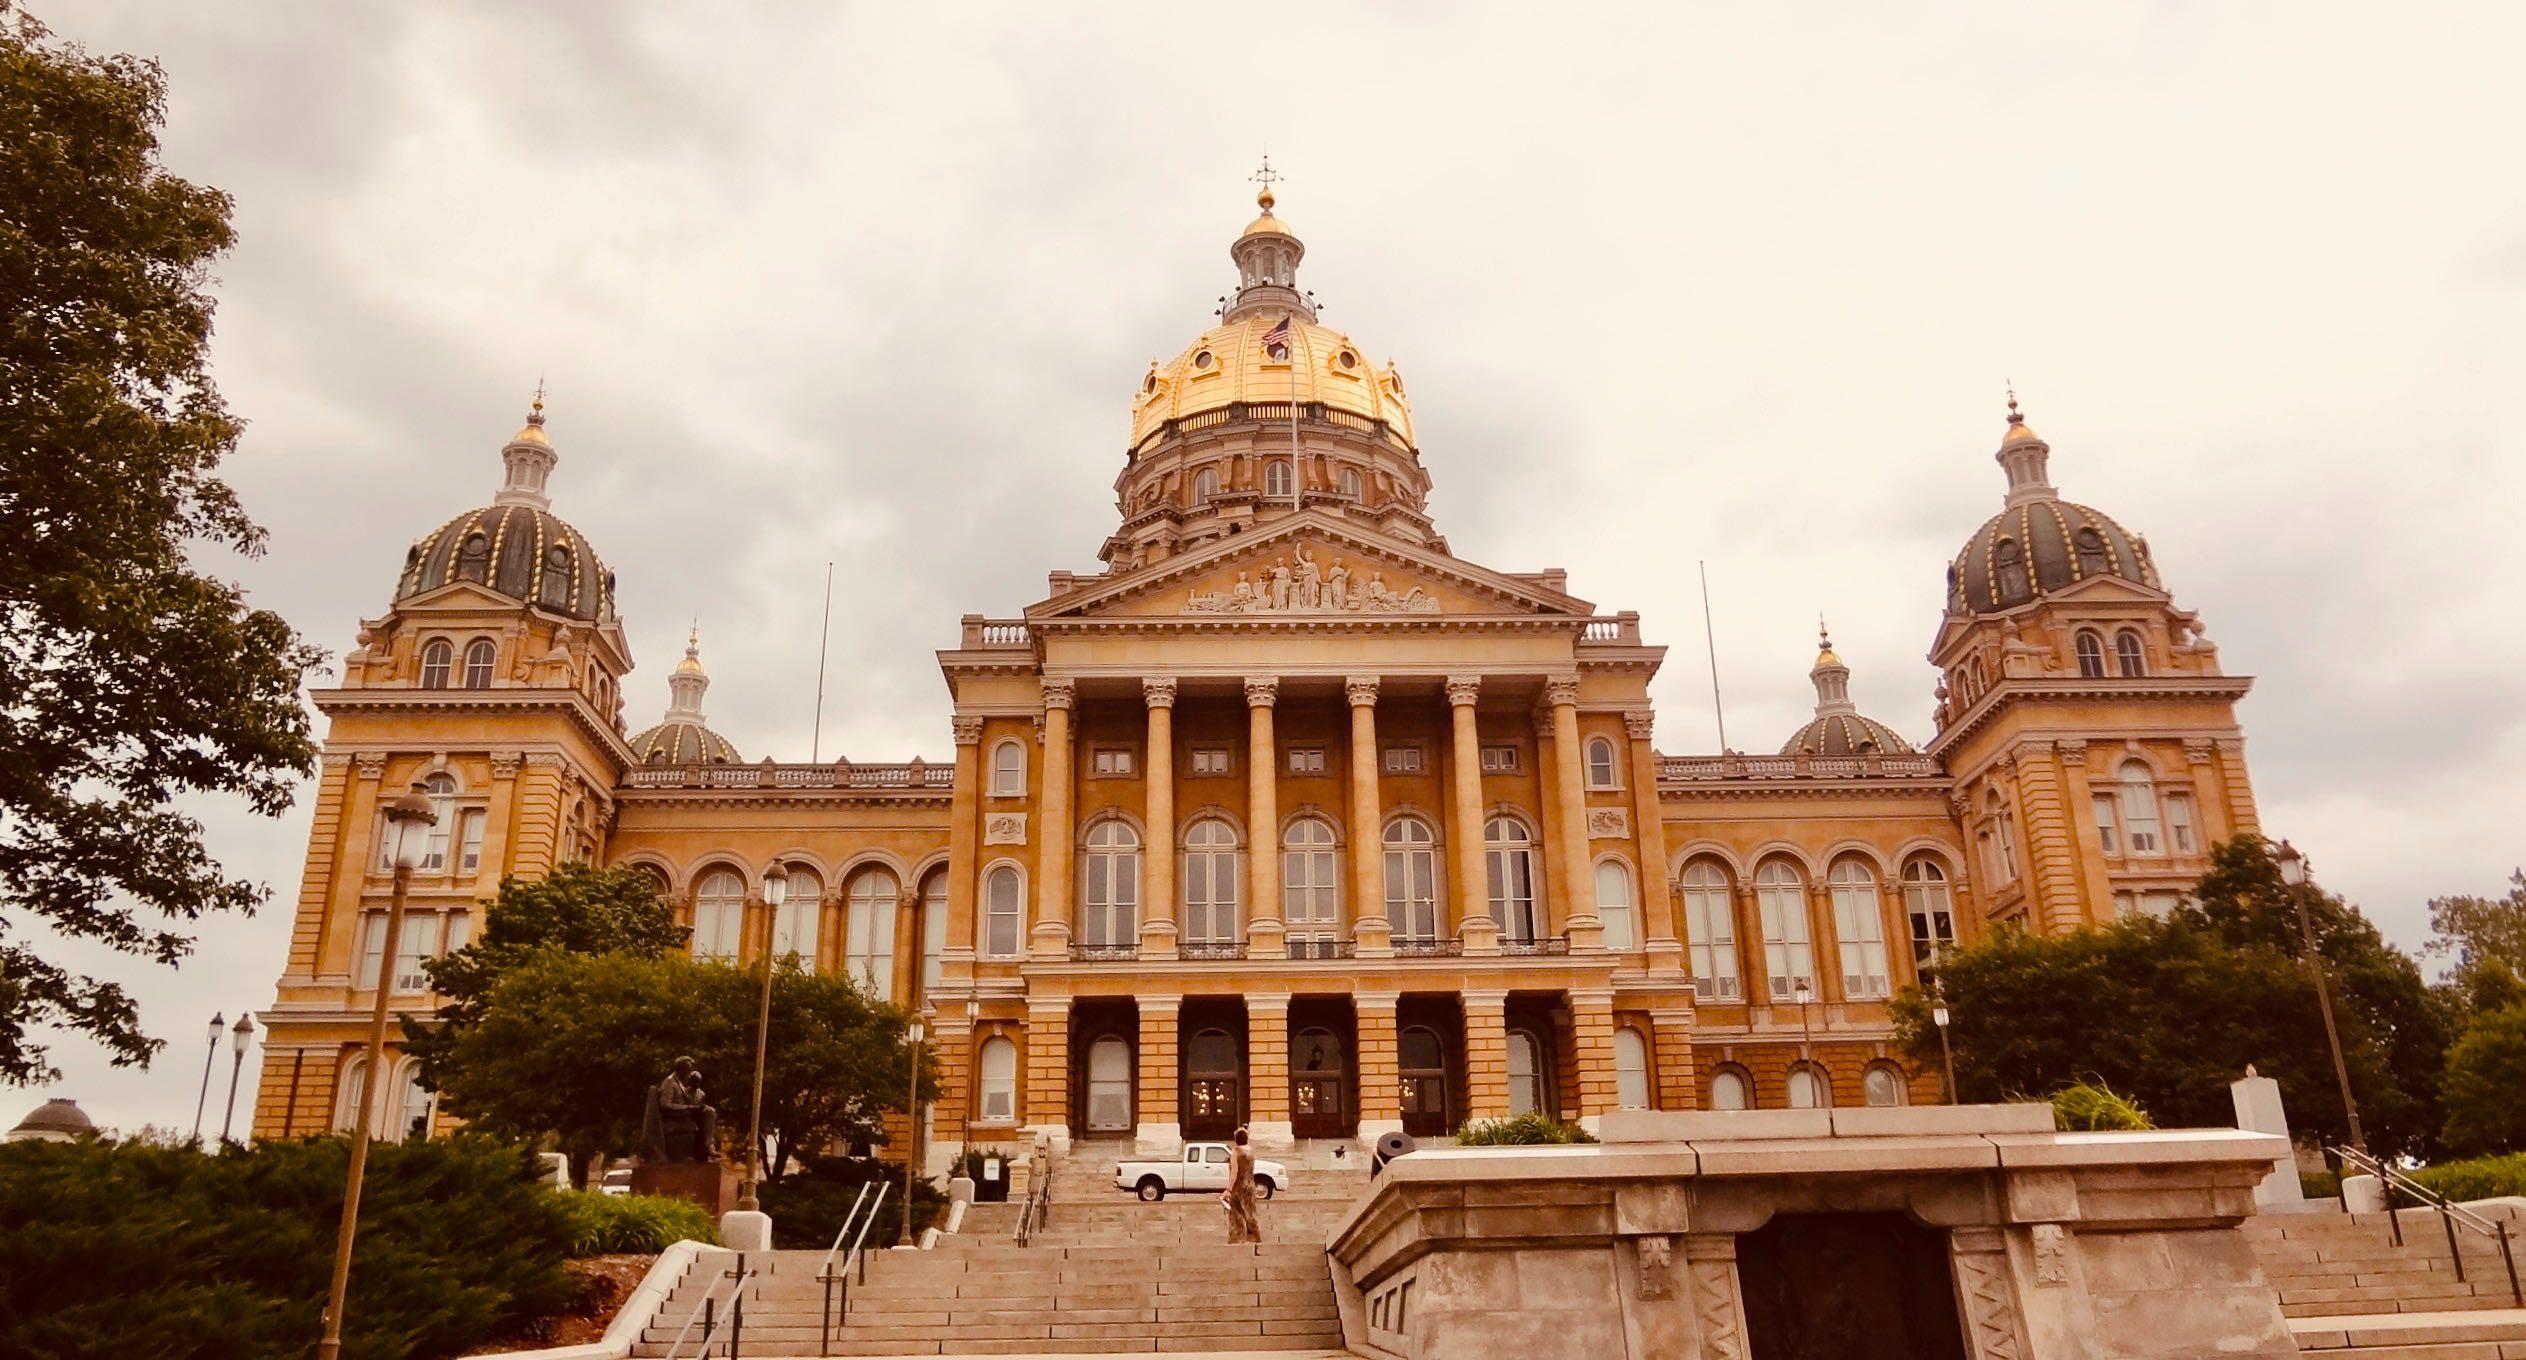 The Iowa State Capitol.